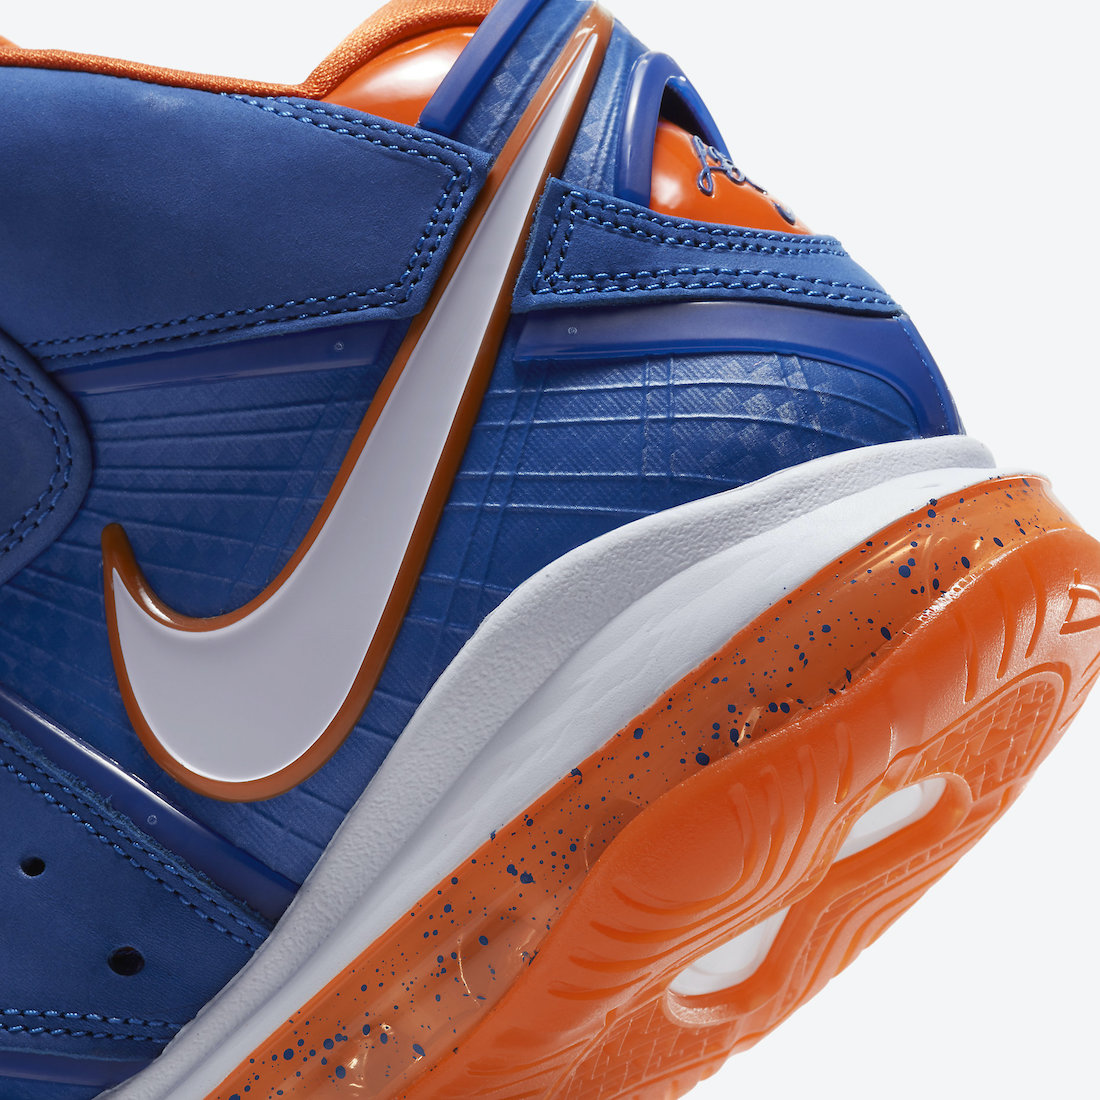 Nike-LeBron-8-HWC-Hardwood-Classic-CV1750-400-2021-Release-Date-Price-7